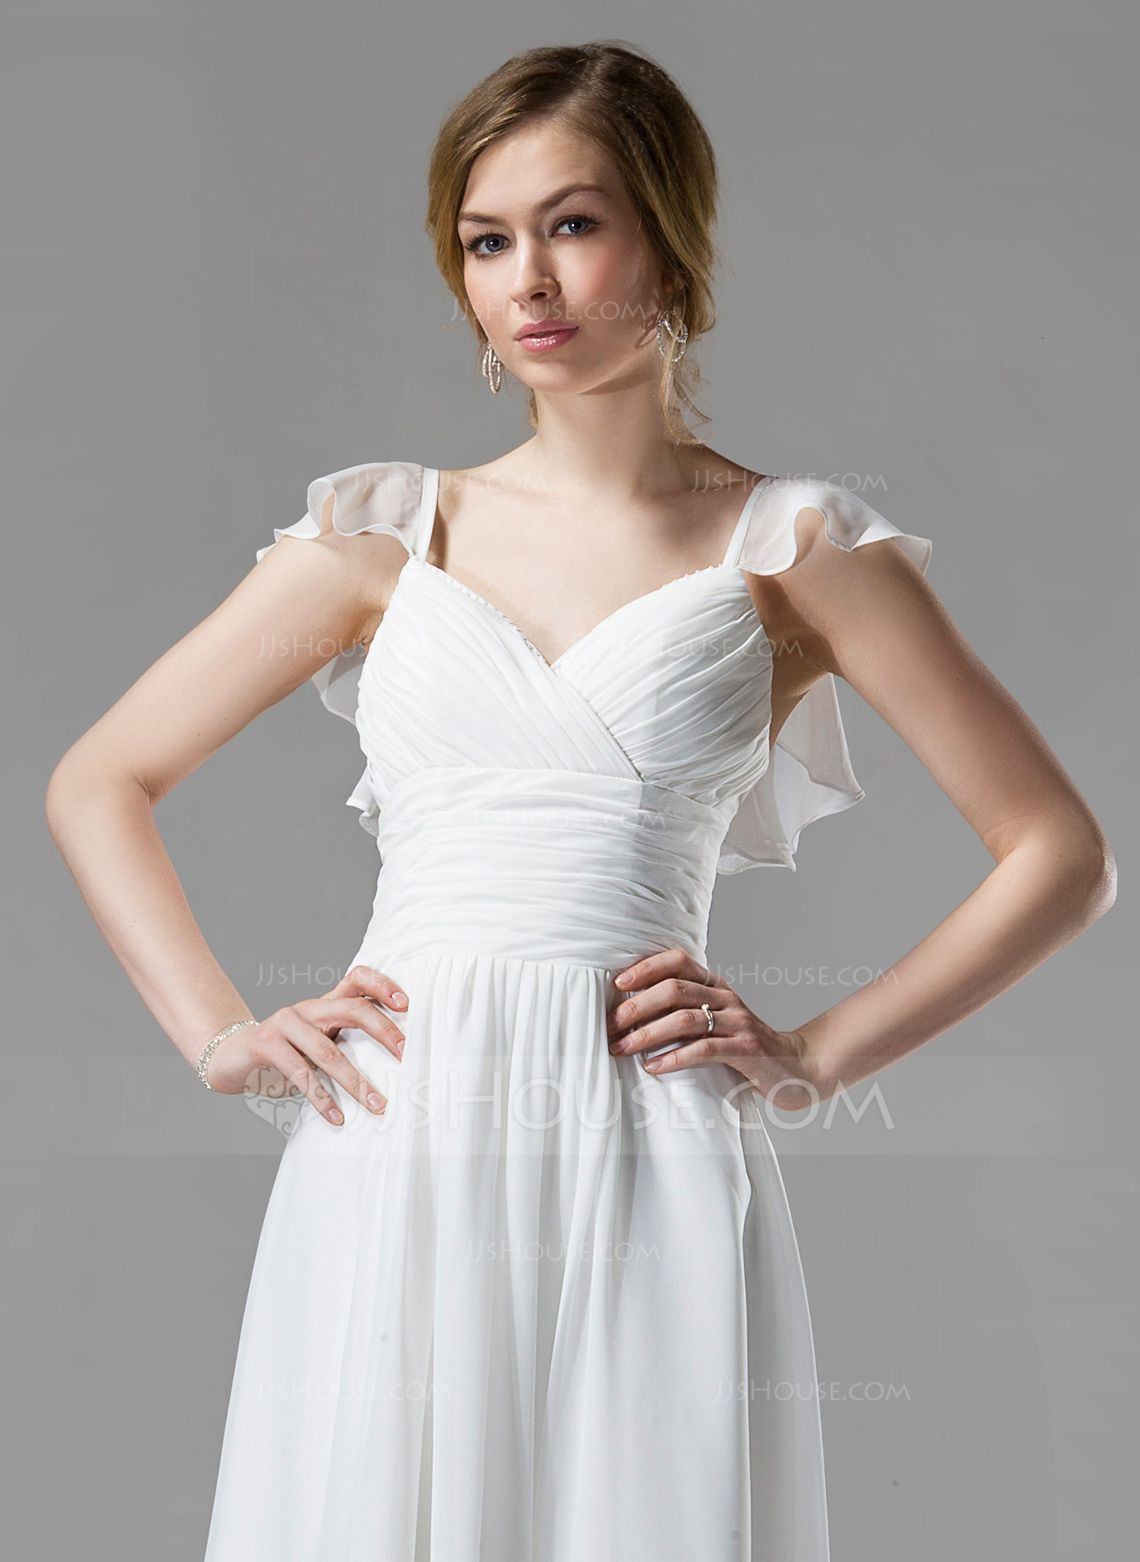 ALine/Princess Vneck KneeLength Chiffon Bridesmaid